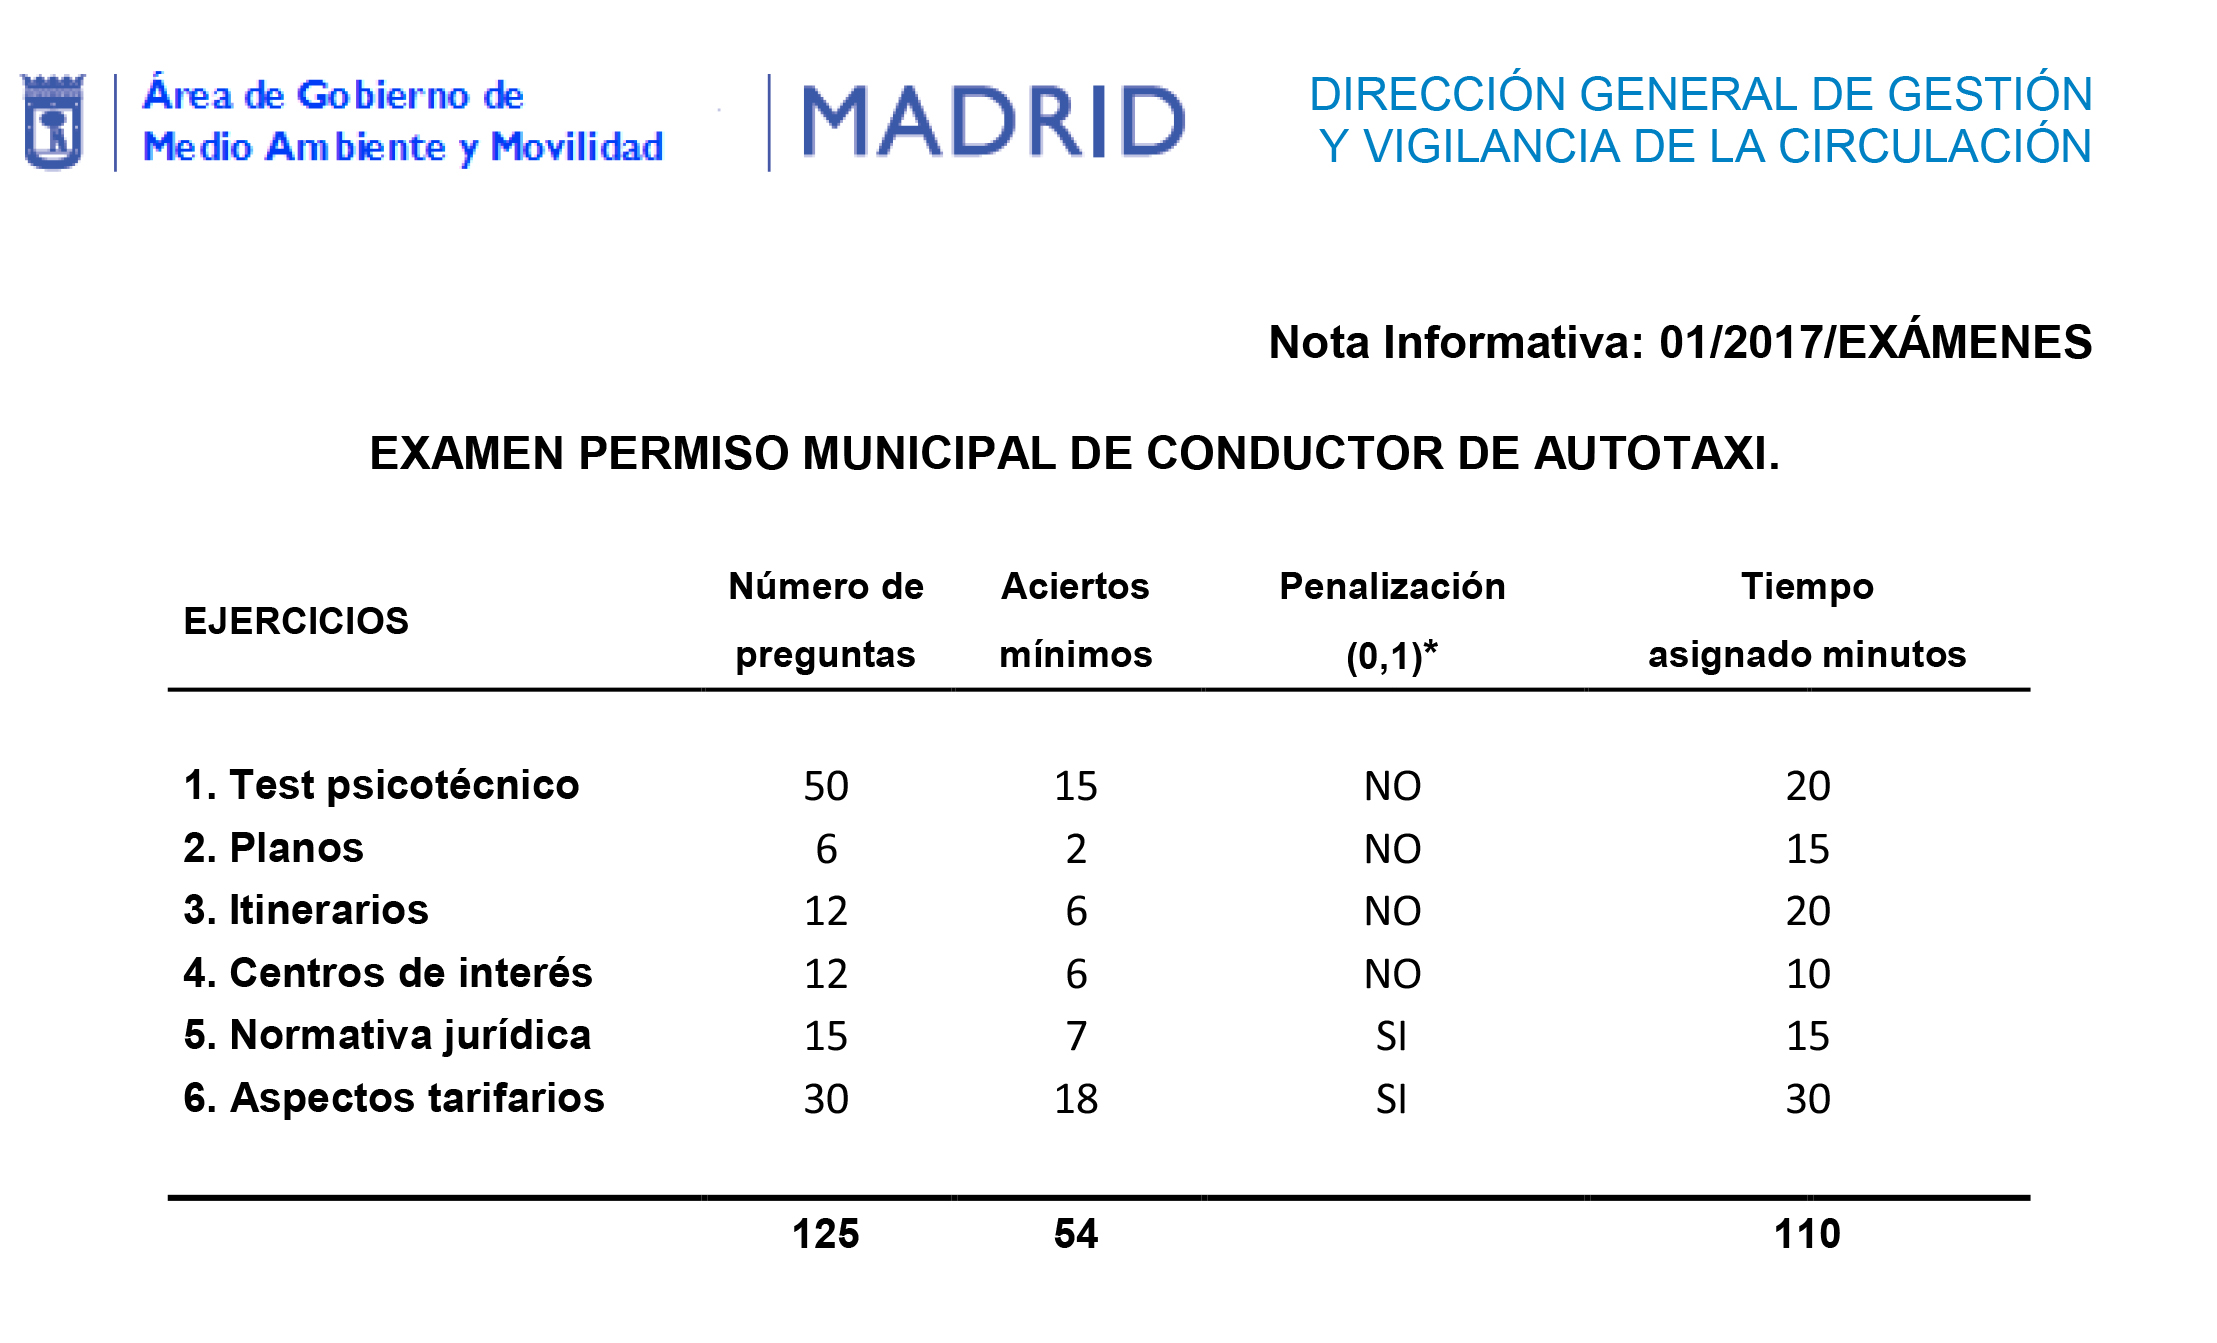 examen permiso municipal de conductor de autotaxi en